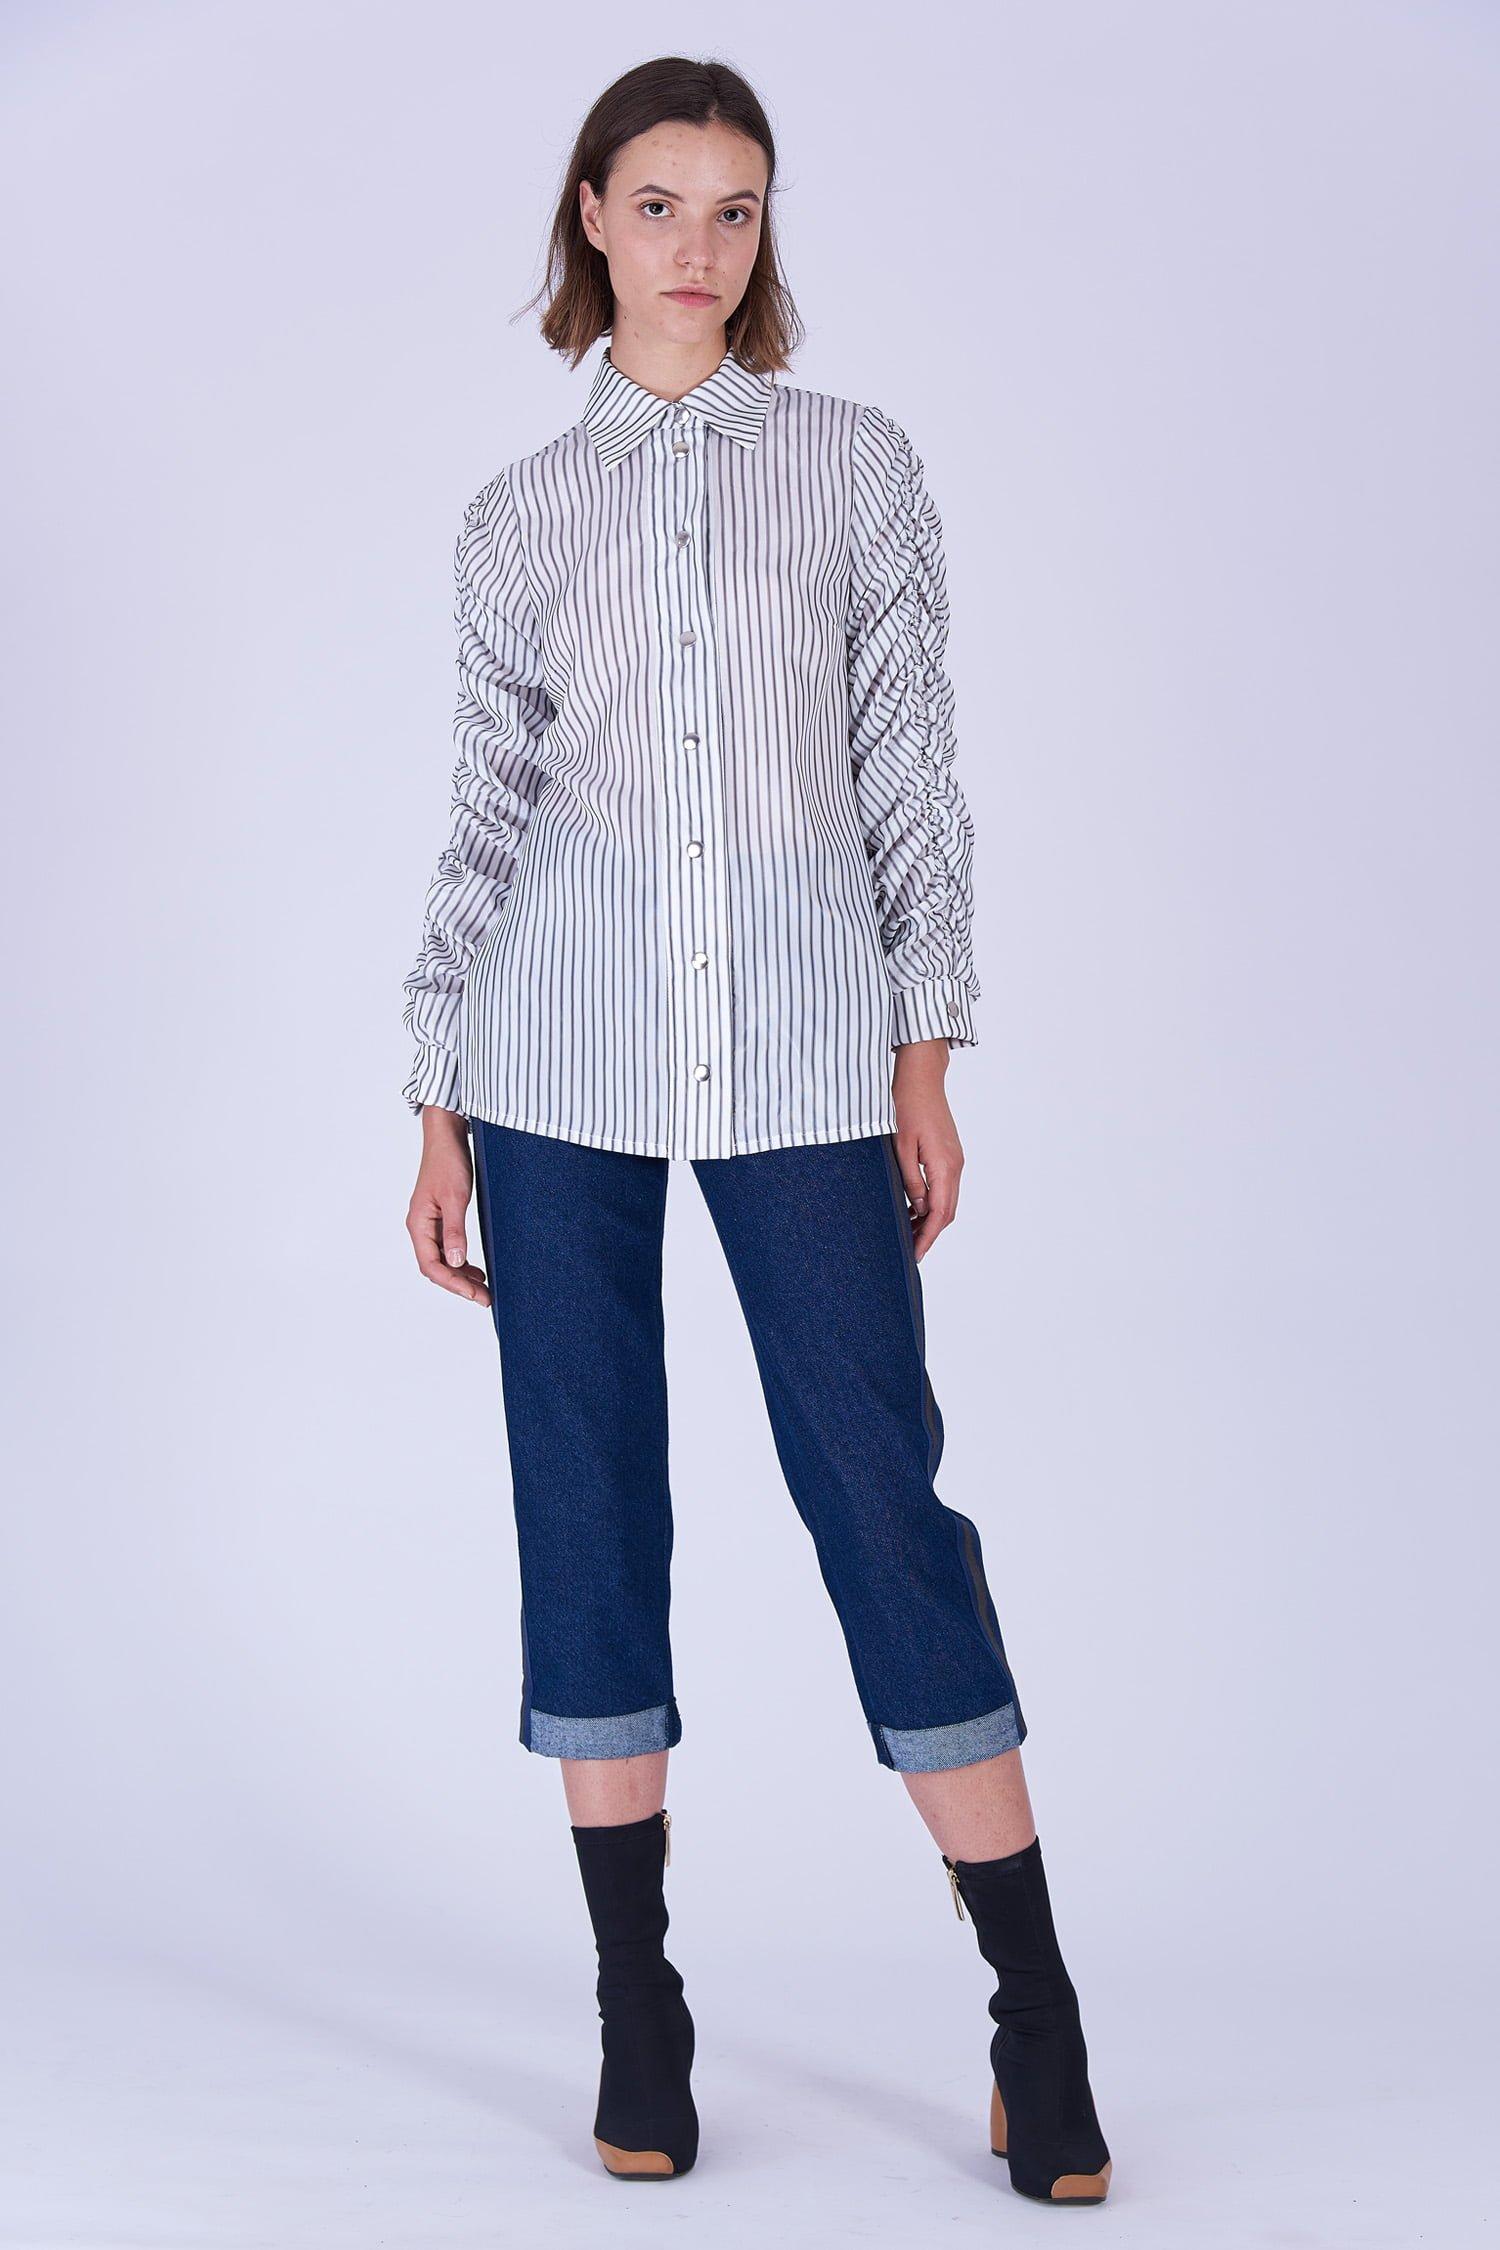 Acephala Fw19 20 White Striped Buttoned Shirt Biala Koszula Paski Front 1